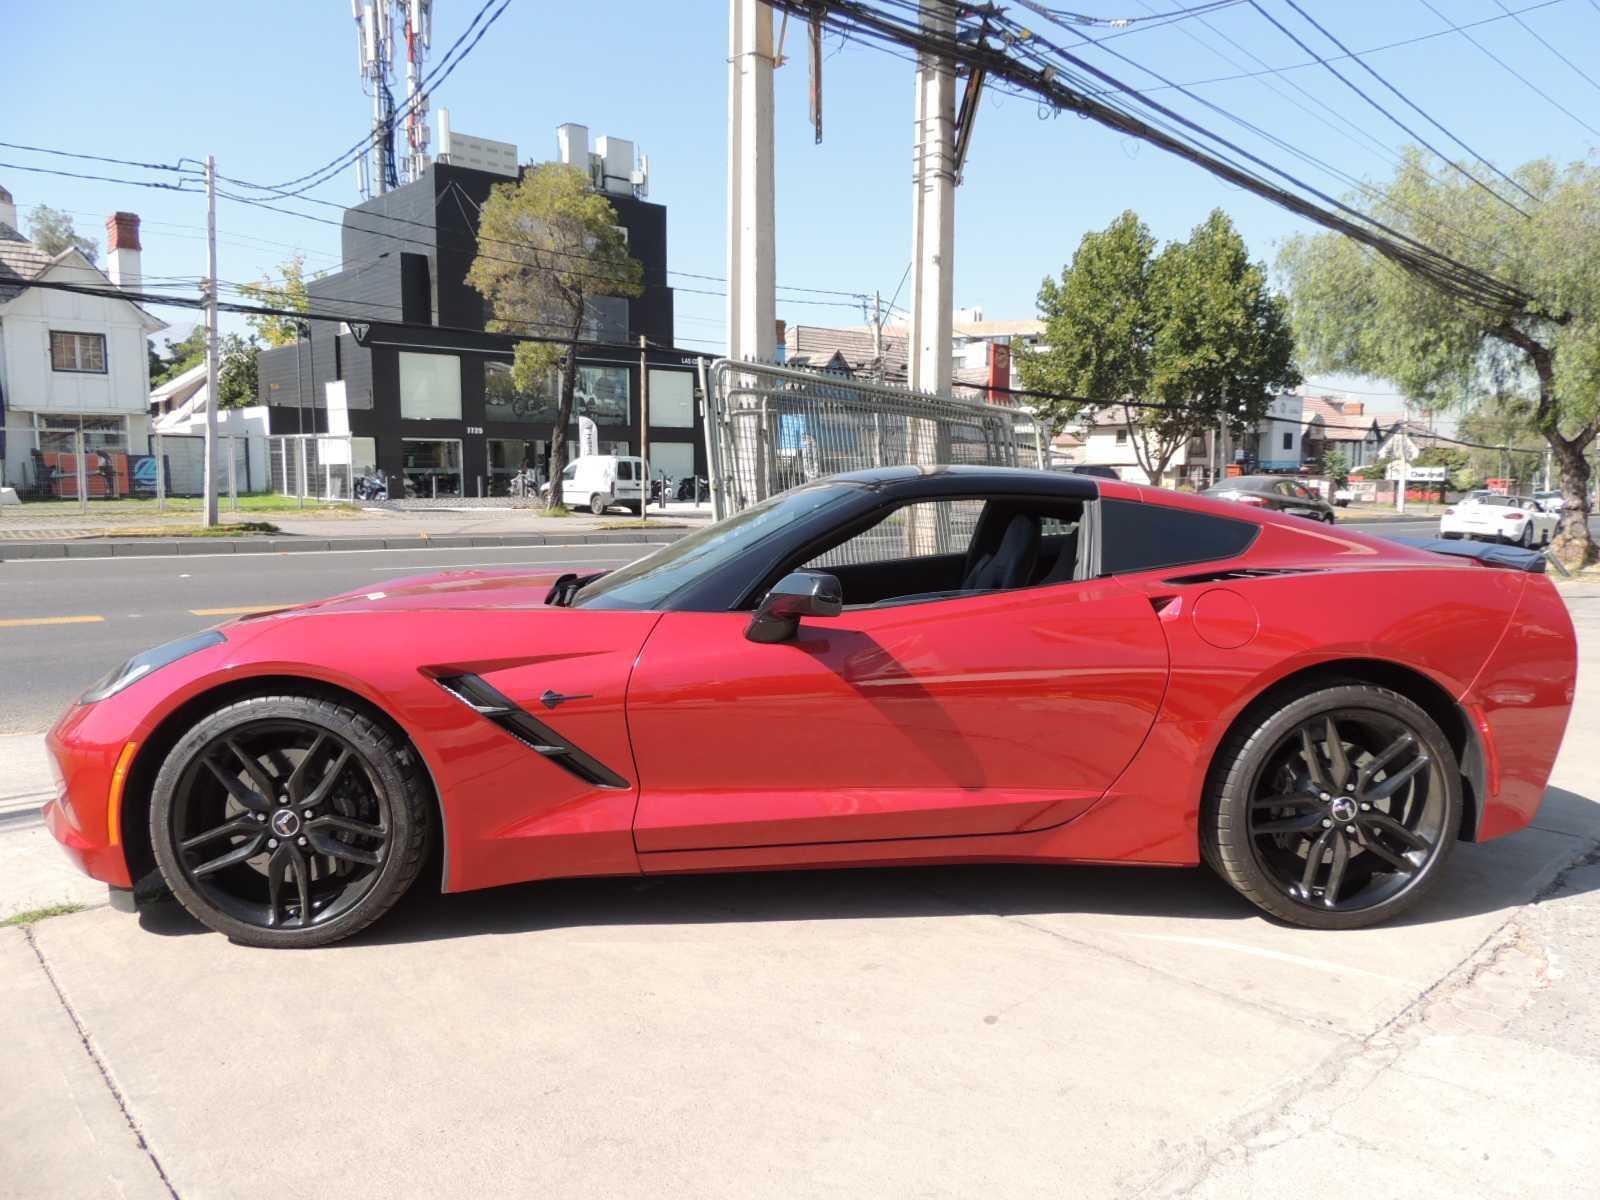 Cherolet Corvette Stingray Clásicos Rutamotor (8)